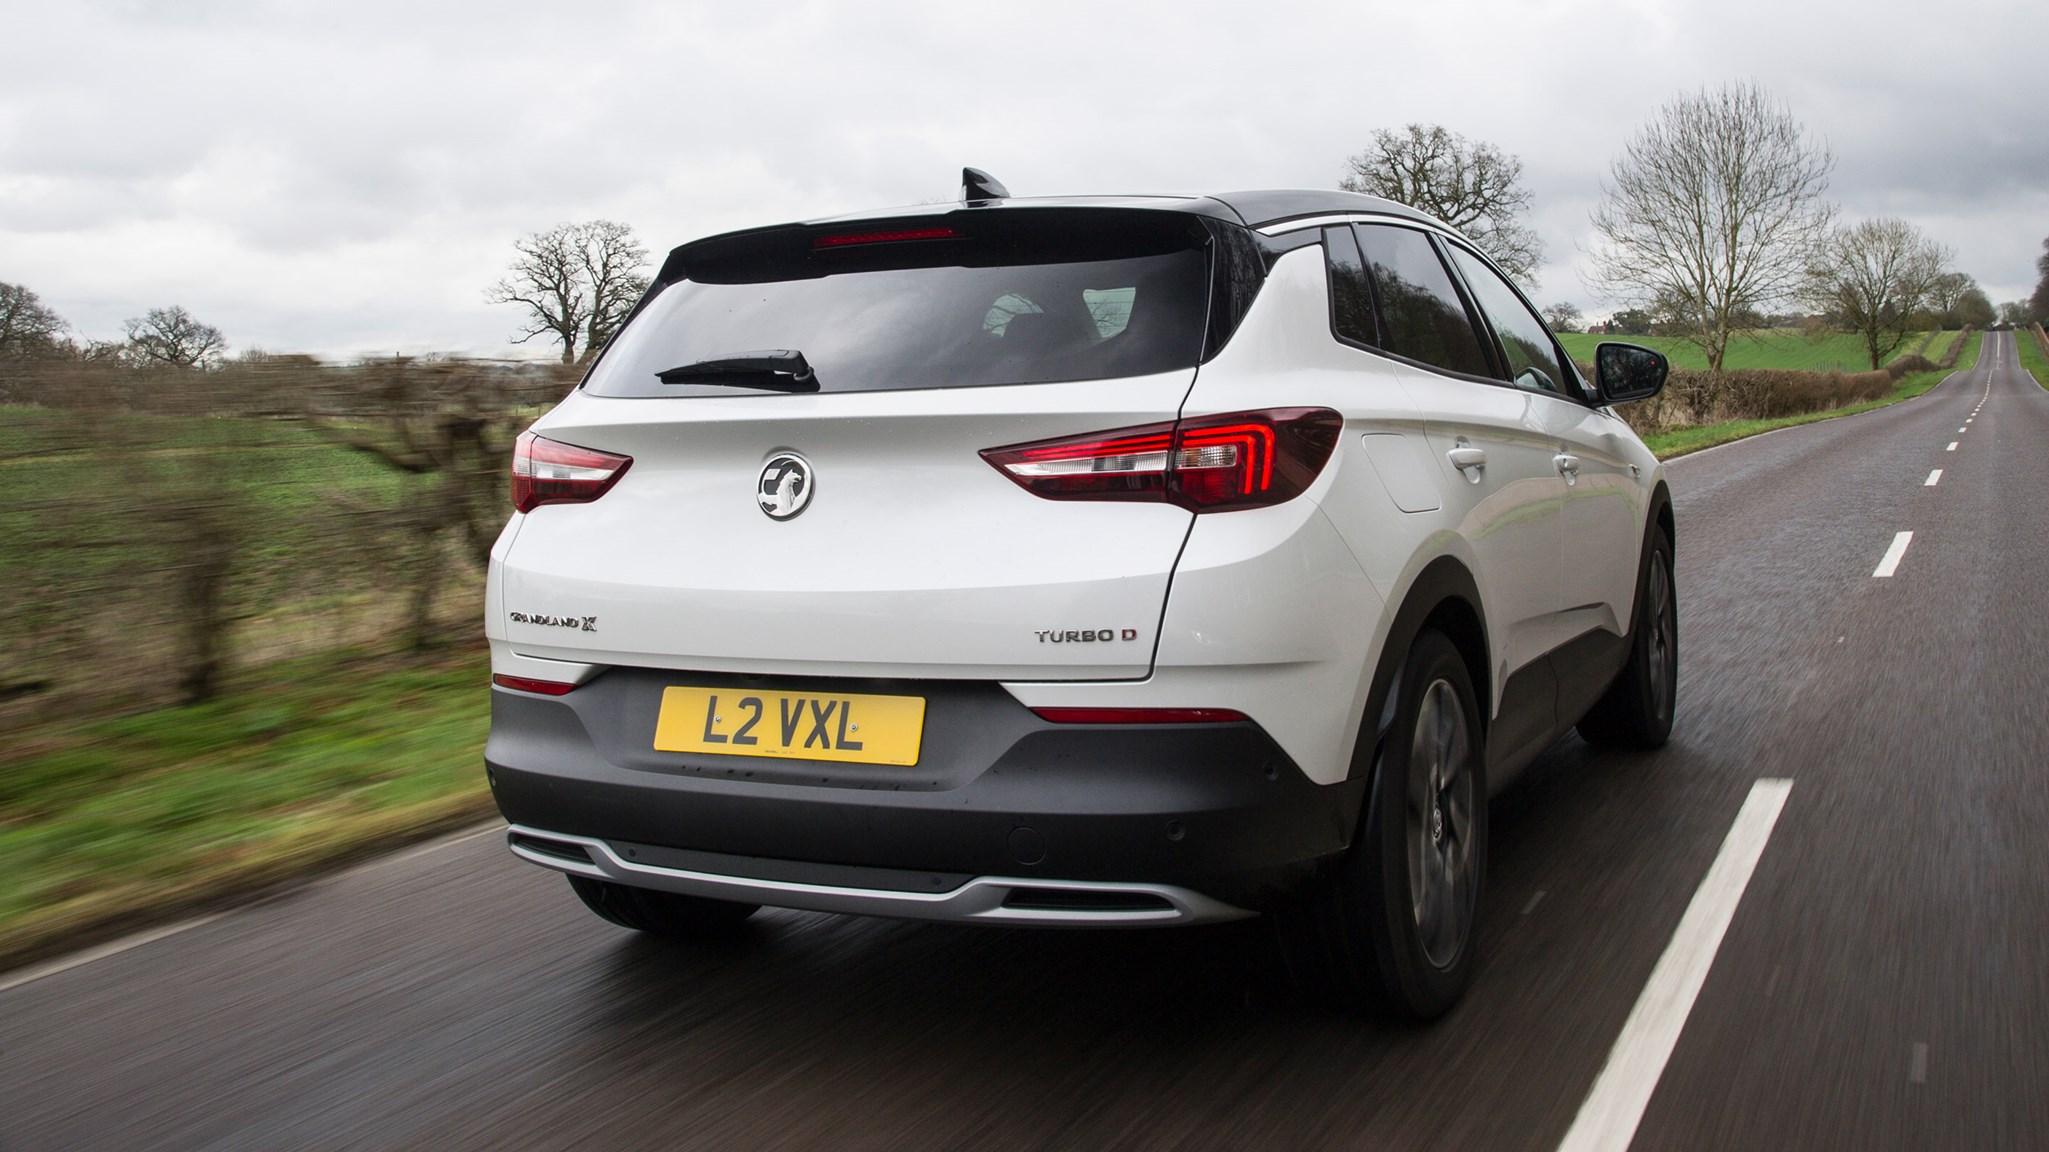 2017 Suv Lease Deals >> Vauxhall Grandland X Ultimate review: SUV supreme or plain 3008? | CAR Magazine